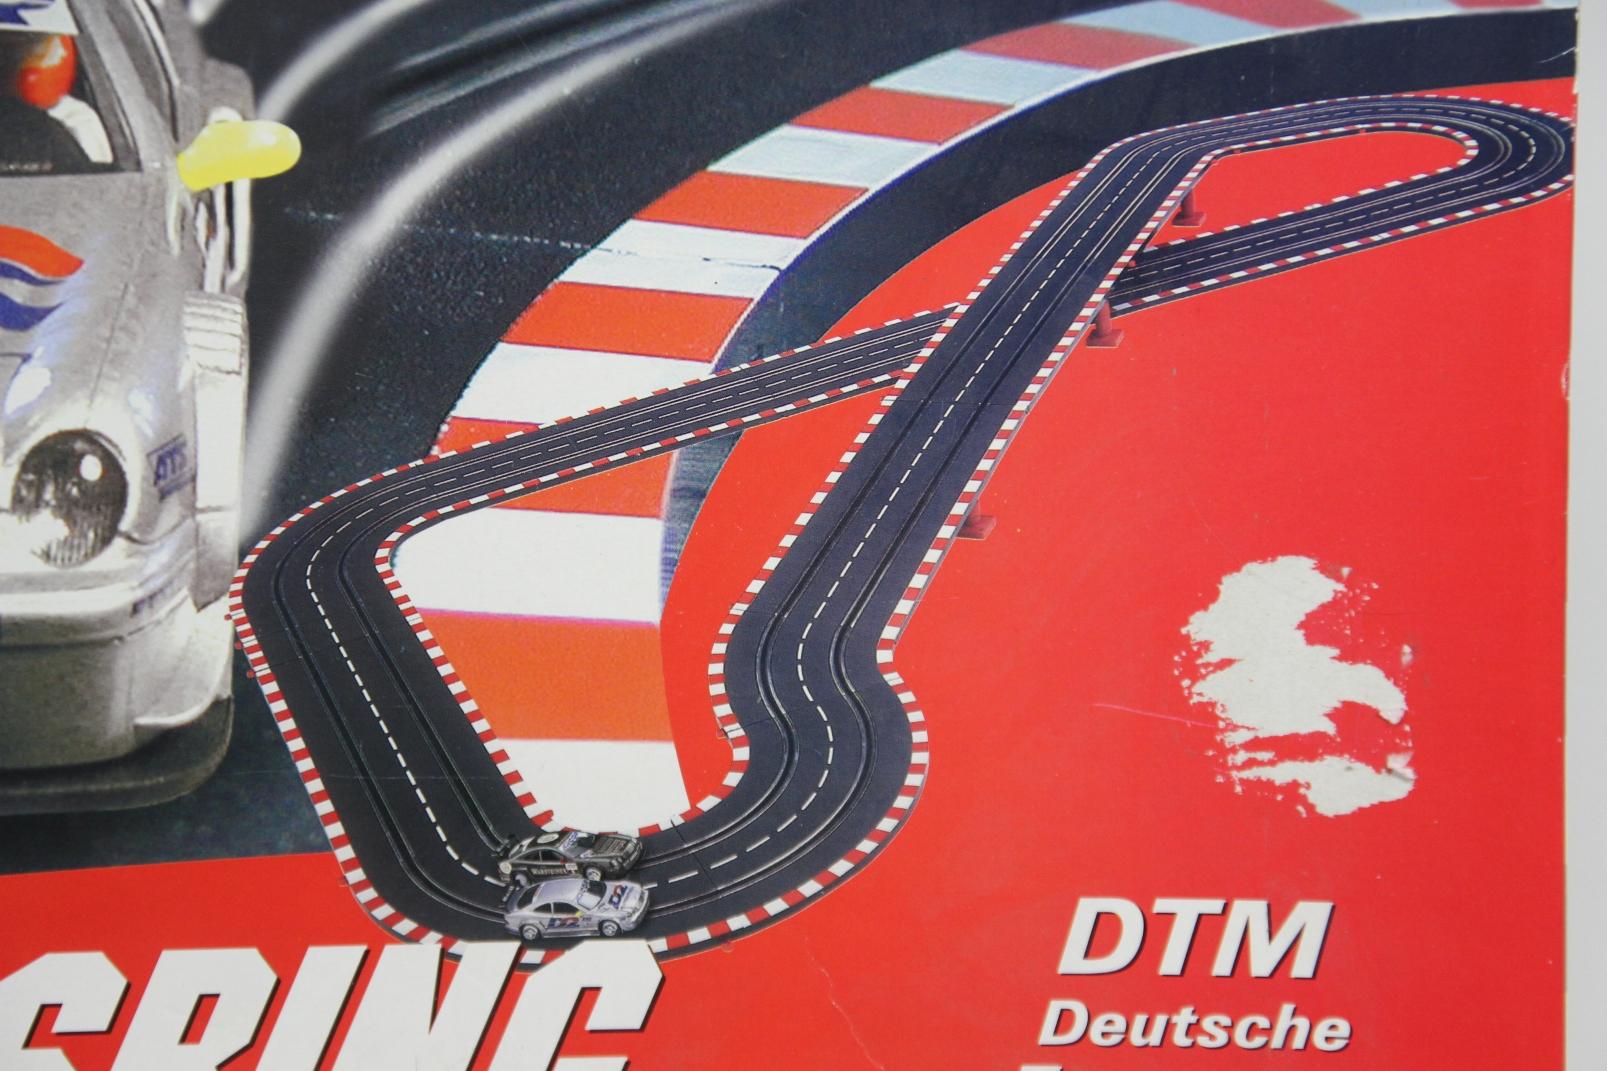 carrera evolution grand prix 25119 auto rennbahn 80x200cm ferrari mercedes ebay. Black Bedroom Furniture Sets. Home Design Ideas